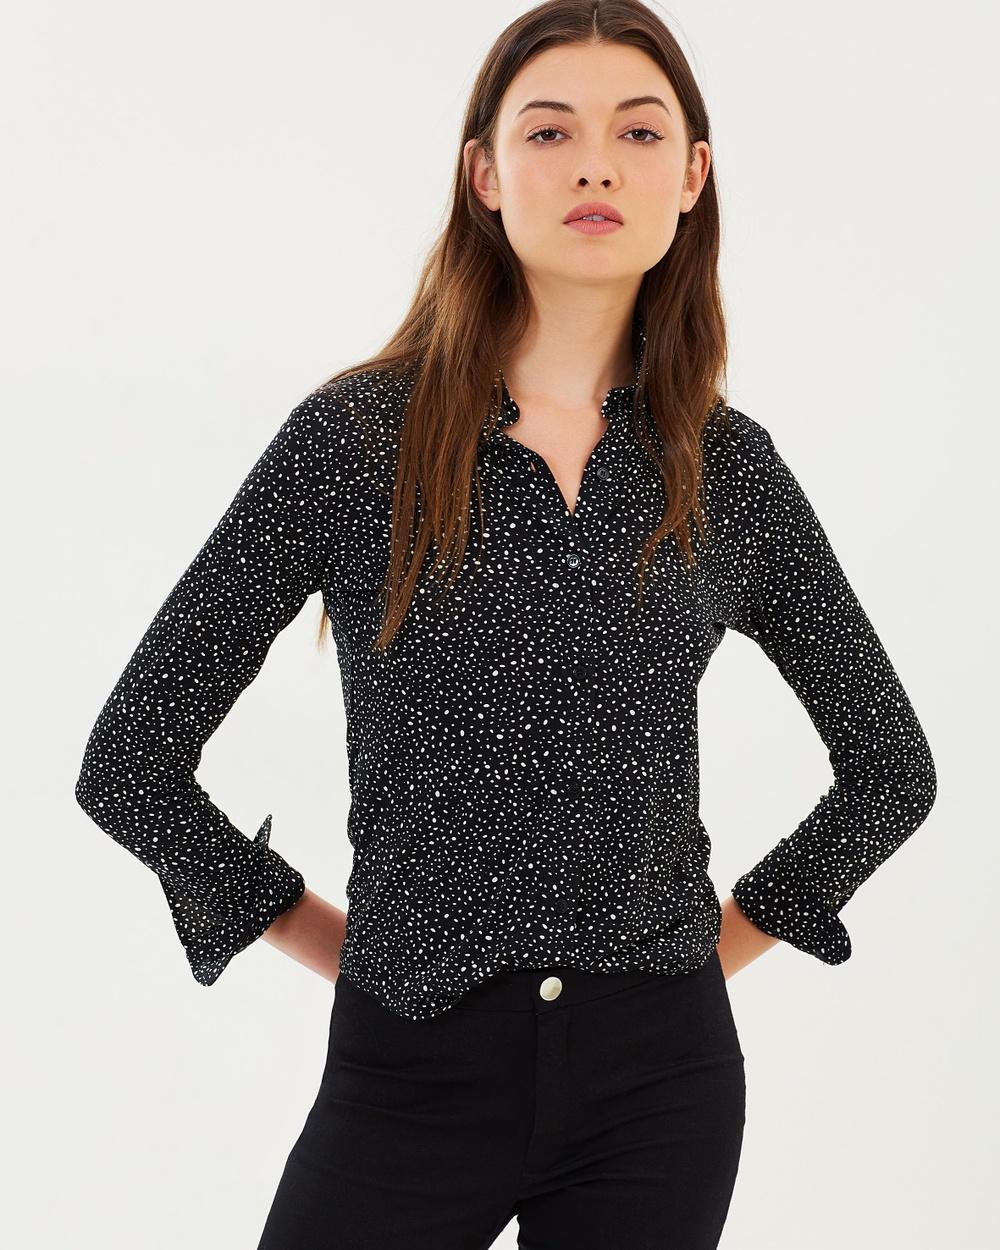 M.N.G Cami Cami Shirt Tops Black Cami Cami Shirt